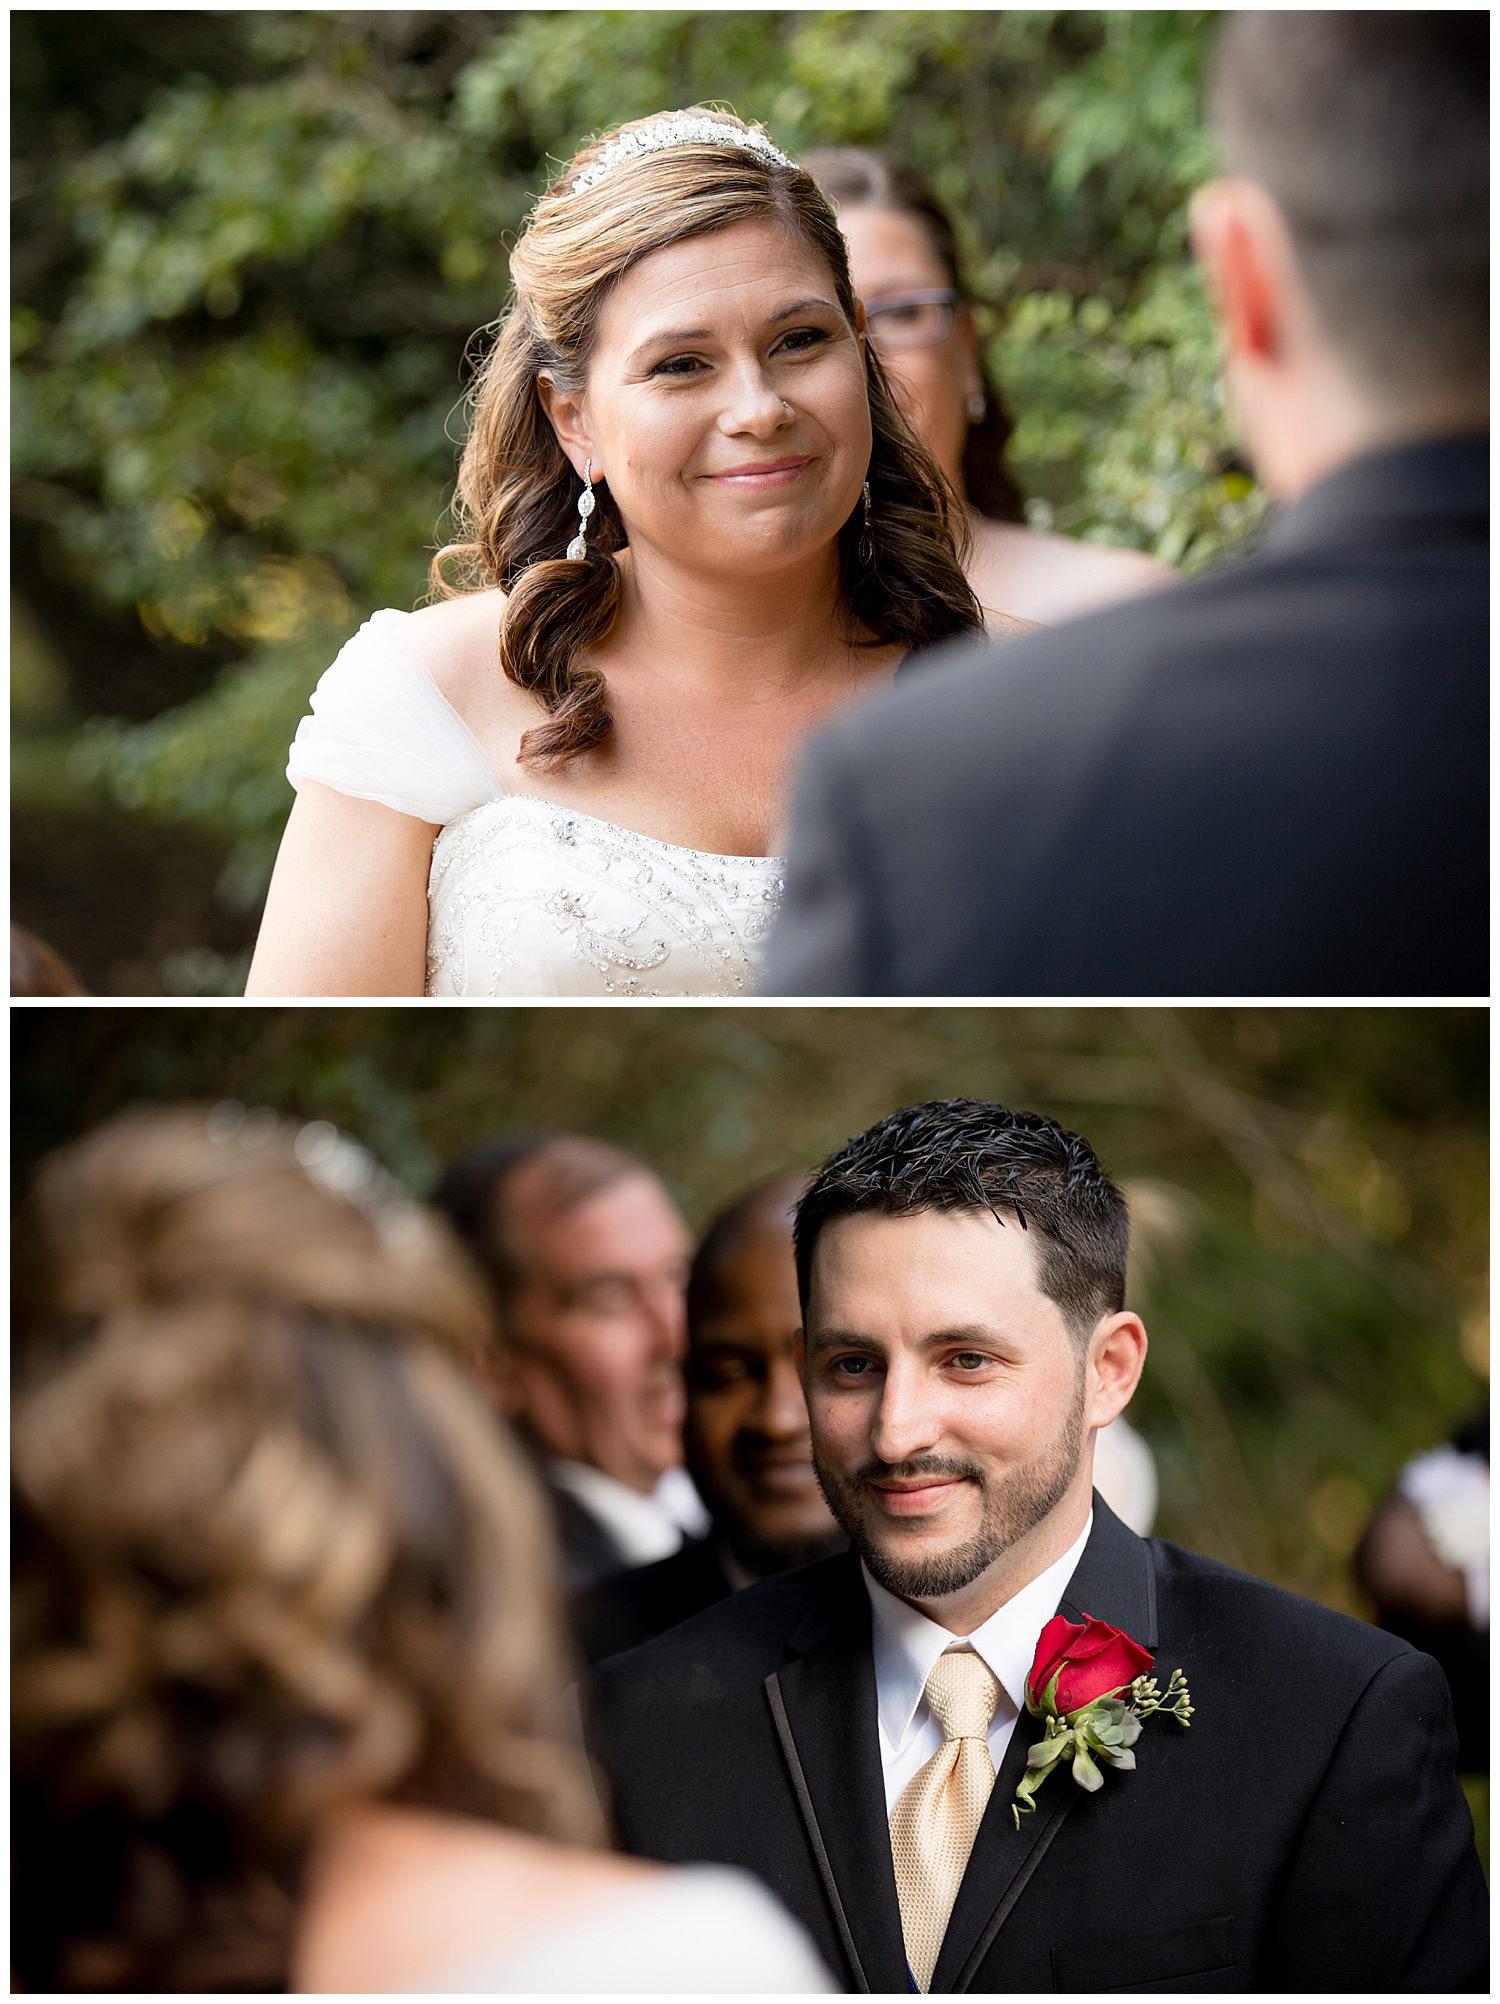 smith-barn-brooksby-farm-wedding-26-north-studios-boston-wedding-photographer-021.jpg